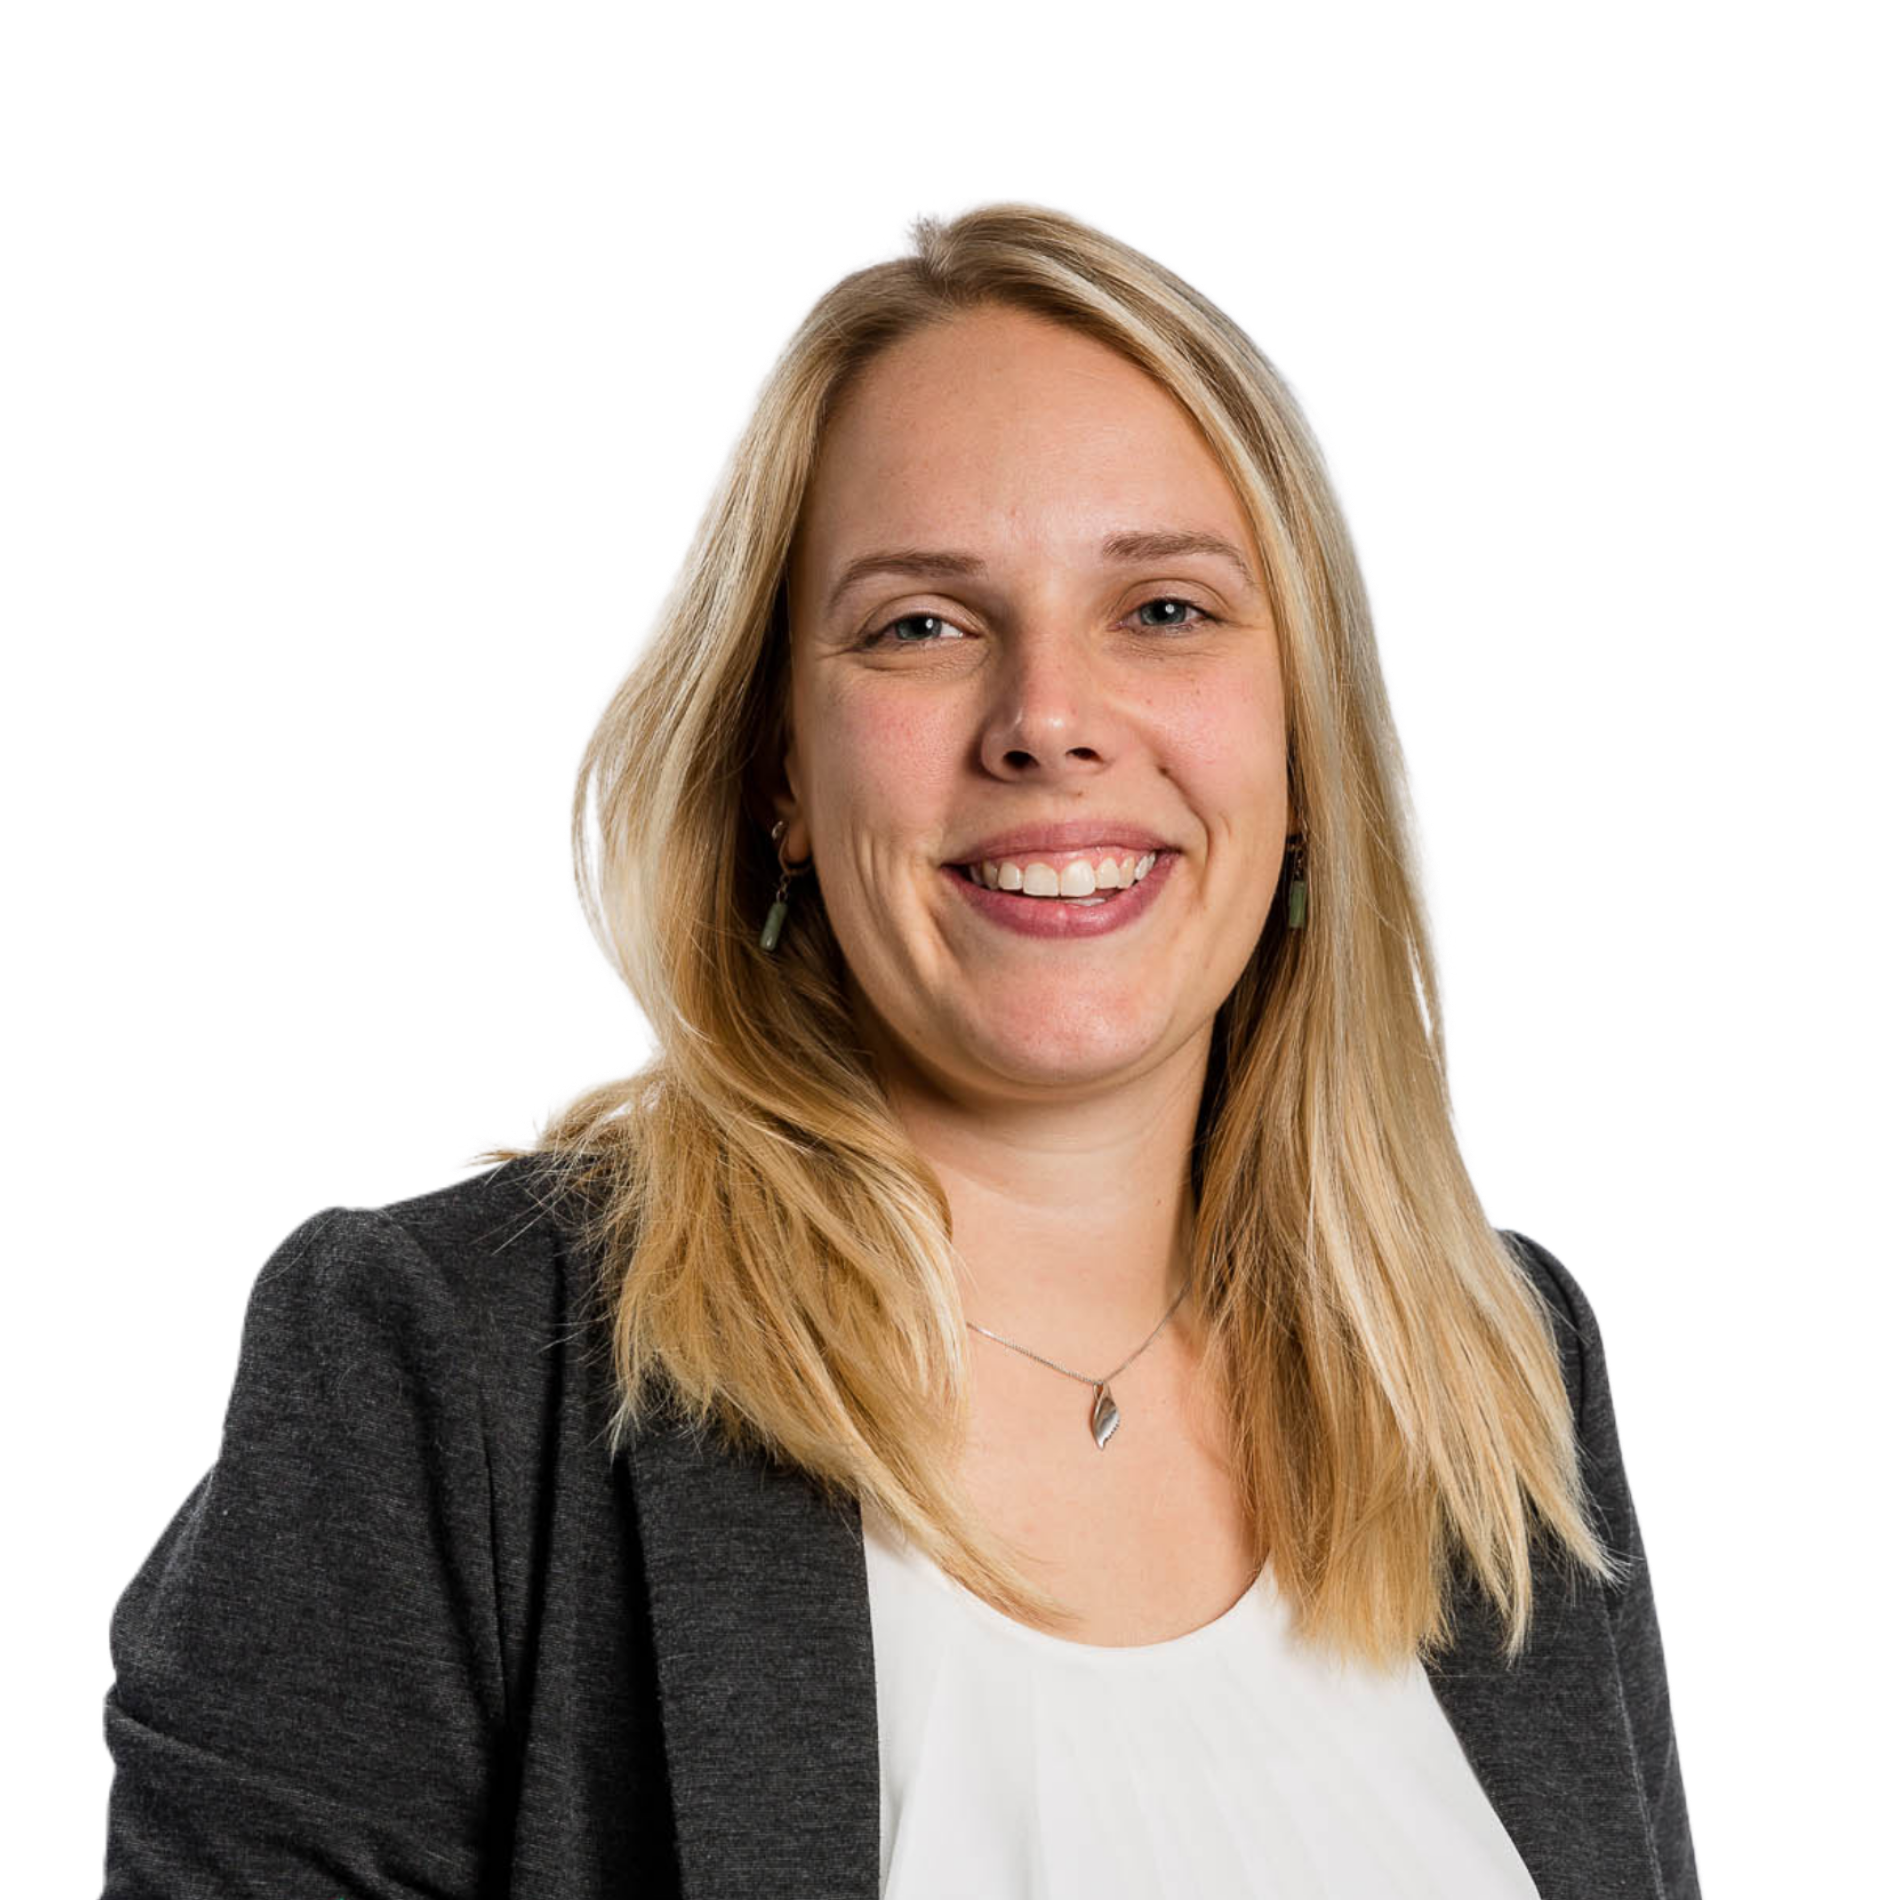 Xenia Hoppenbrouwer